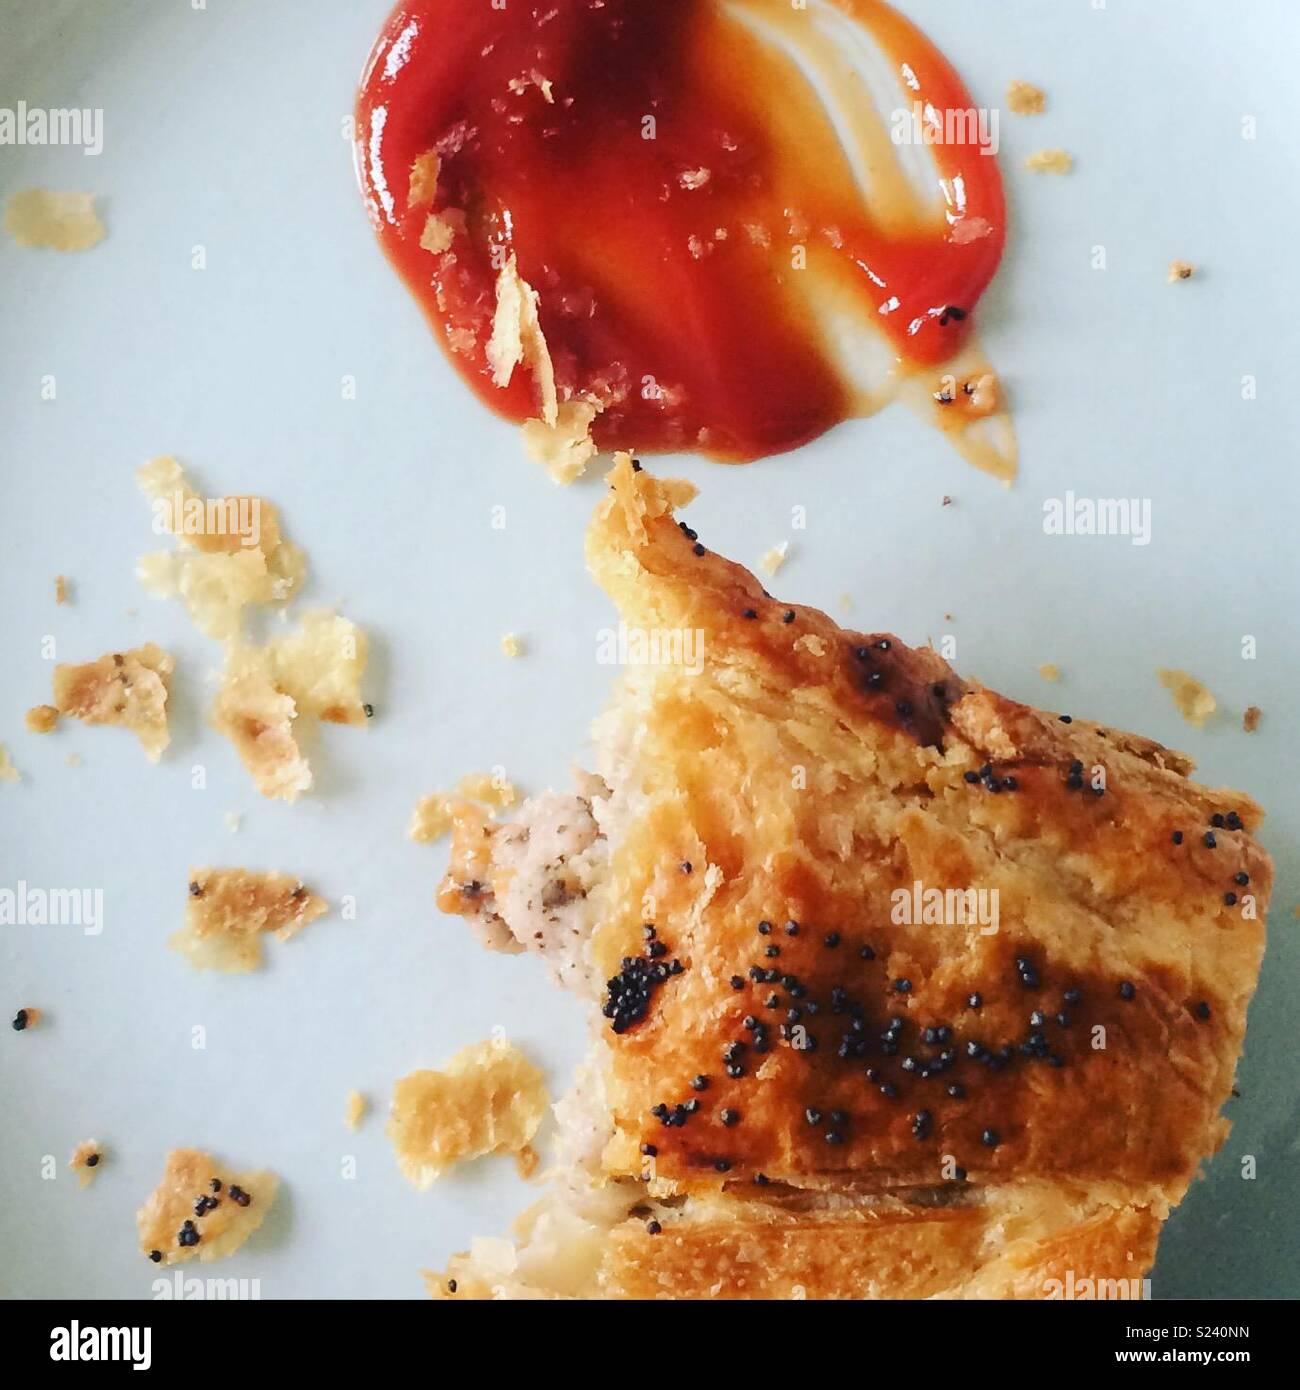 Posh sausage roll and ketchup. Half way through being eaten. - Stock Image